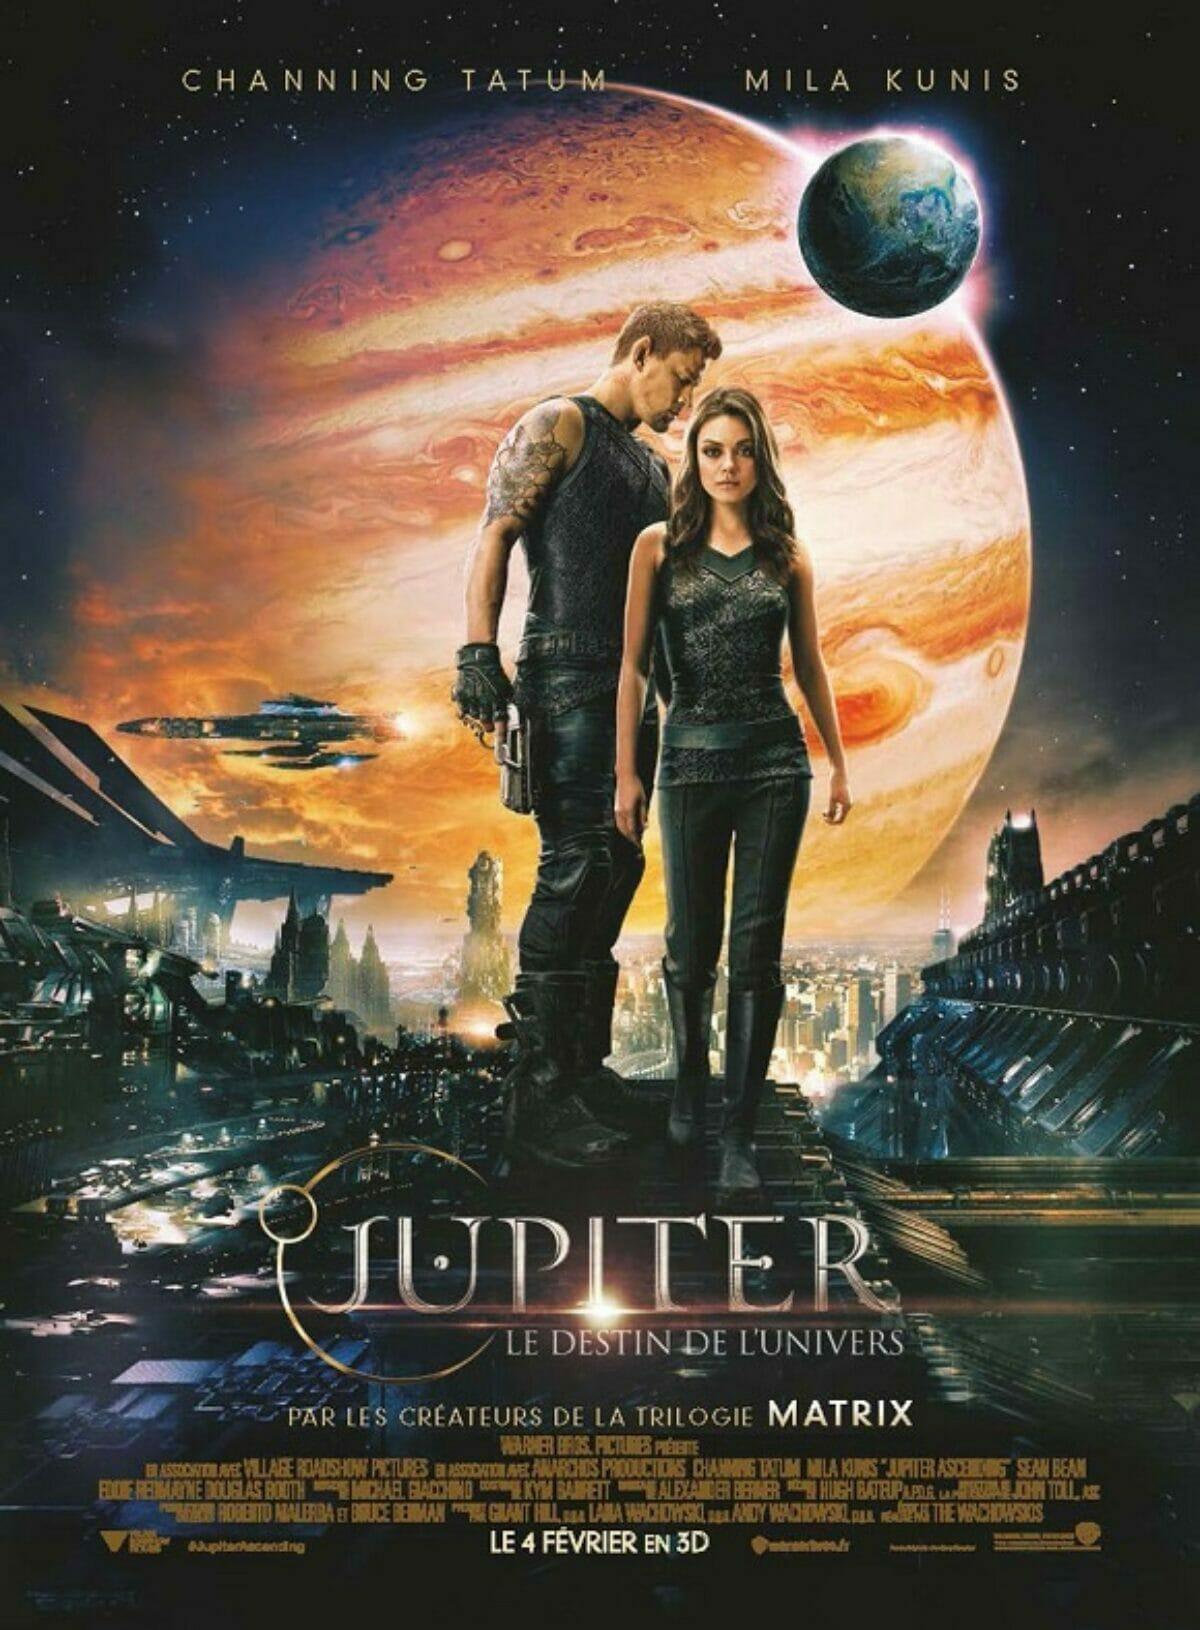 Jupiter-le-destin-de-lunivers-affiche-poster